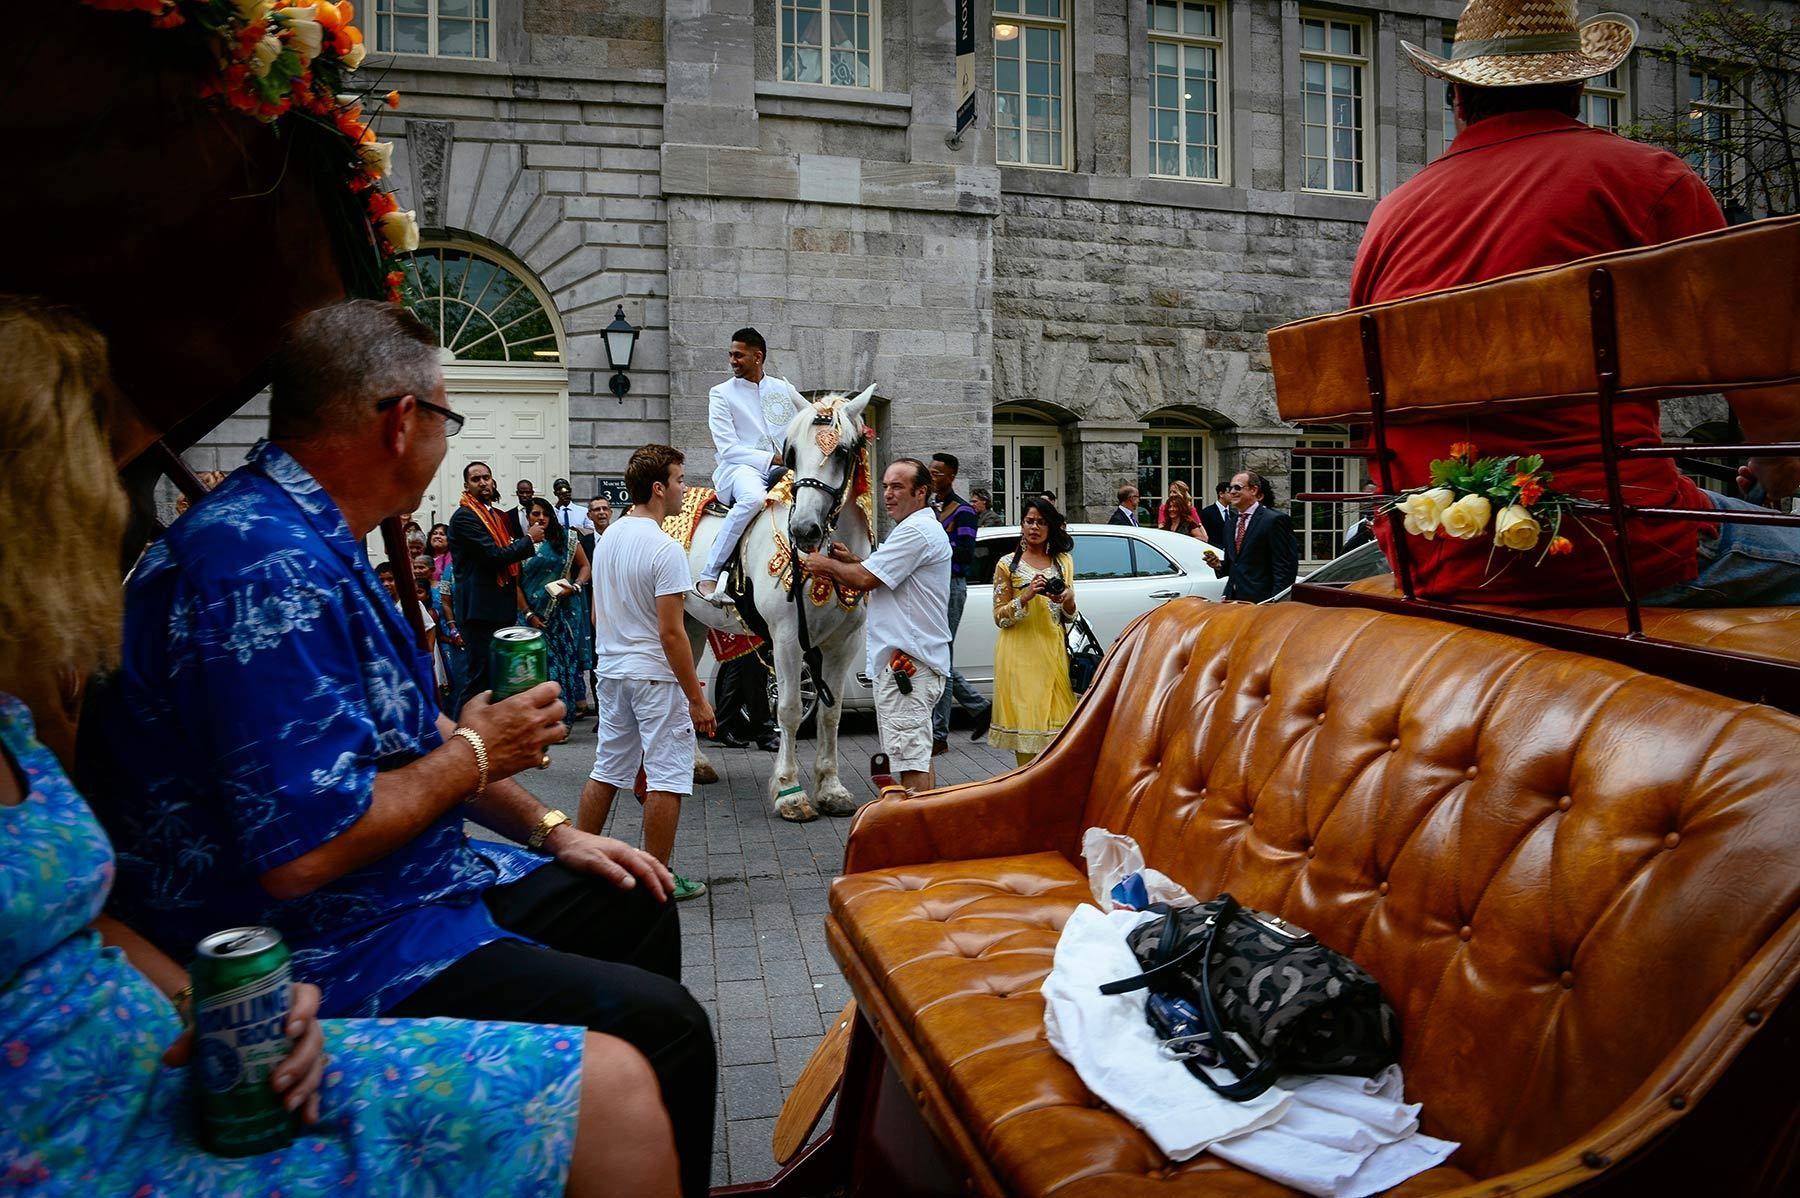 Indian wedding in Old port Montreal,  baraat , groom's wedding procession